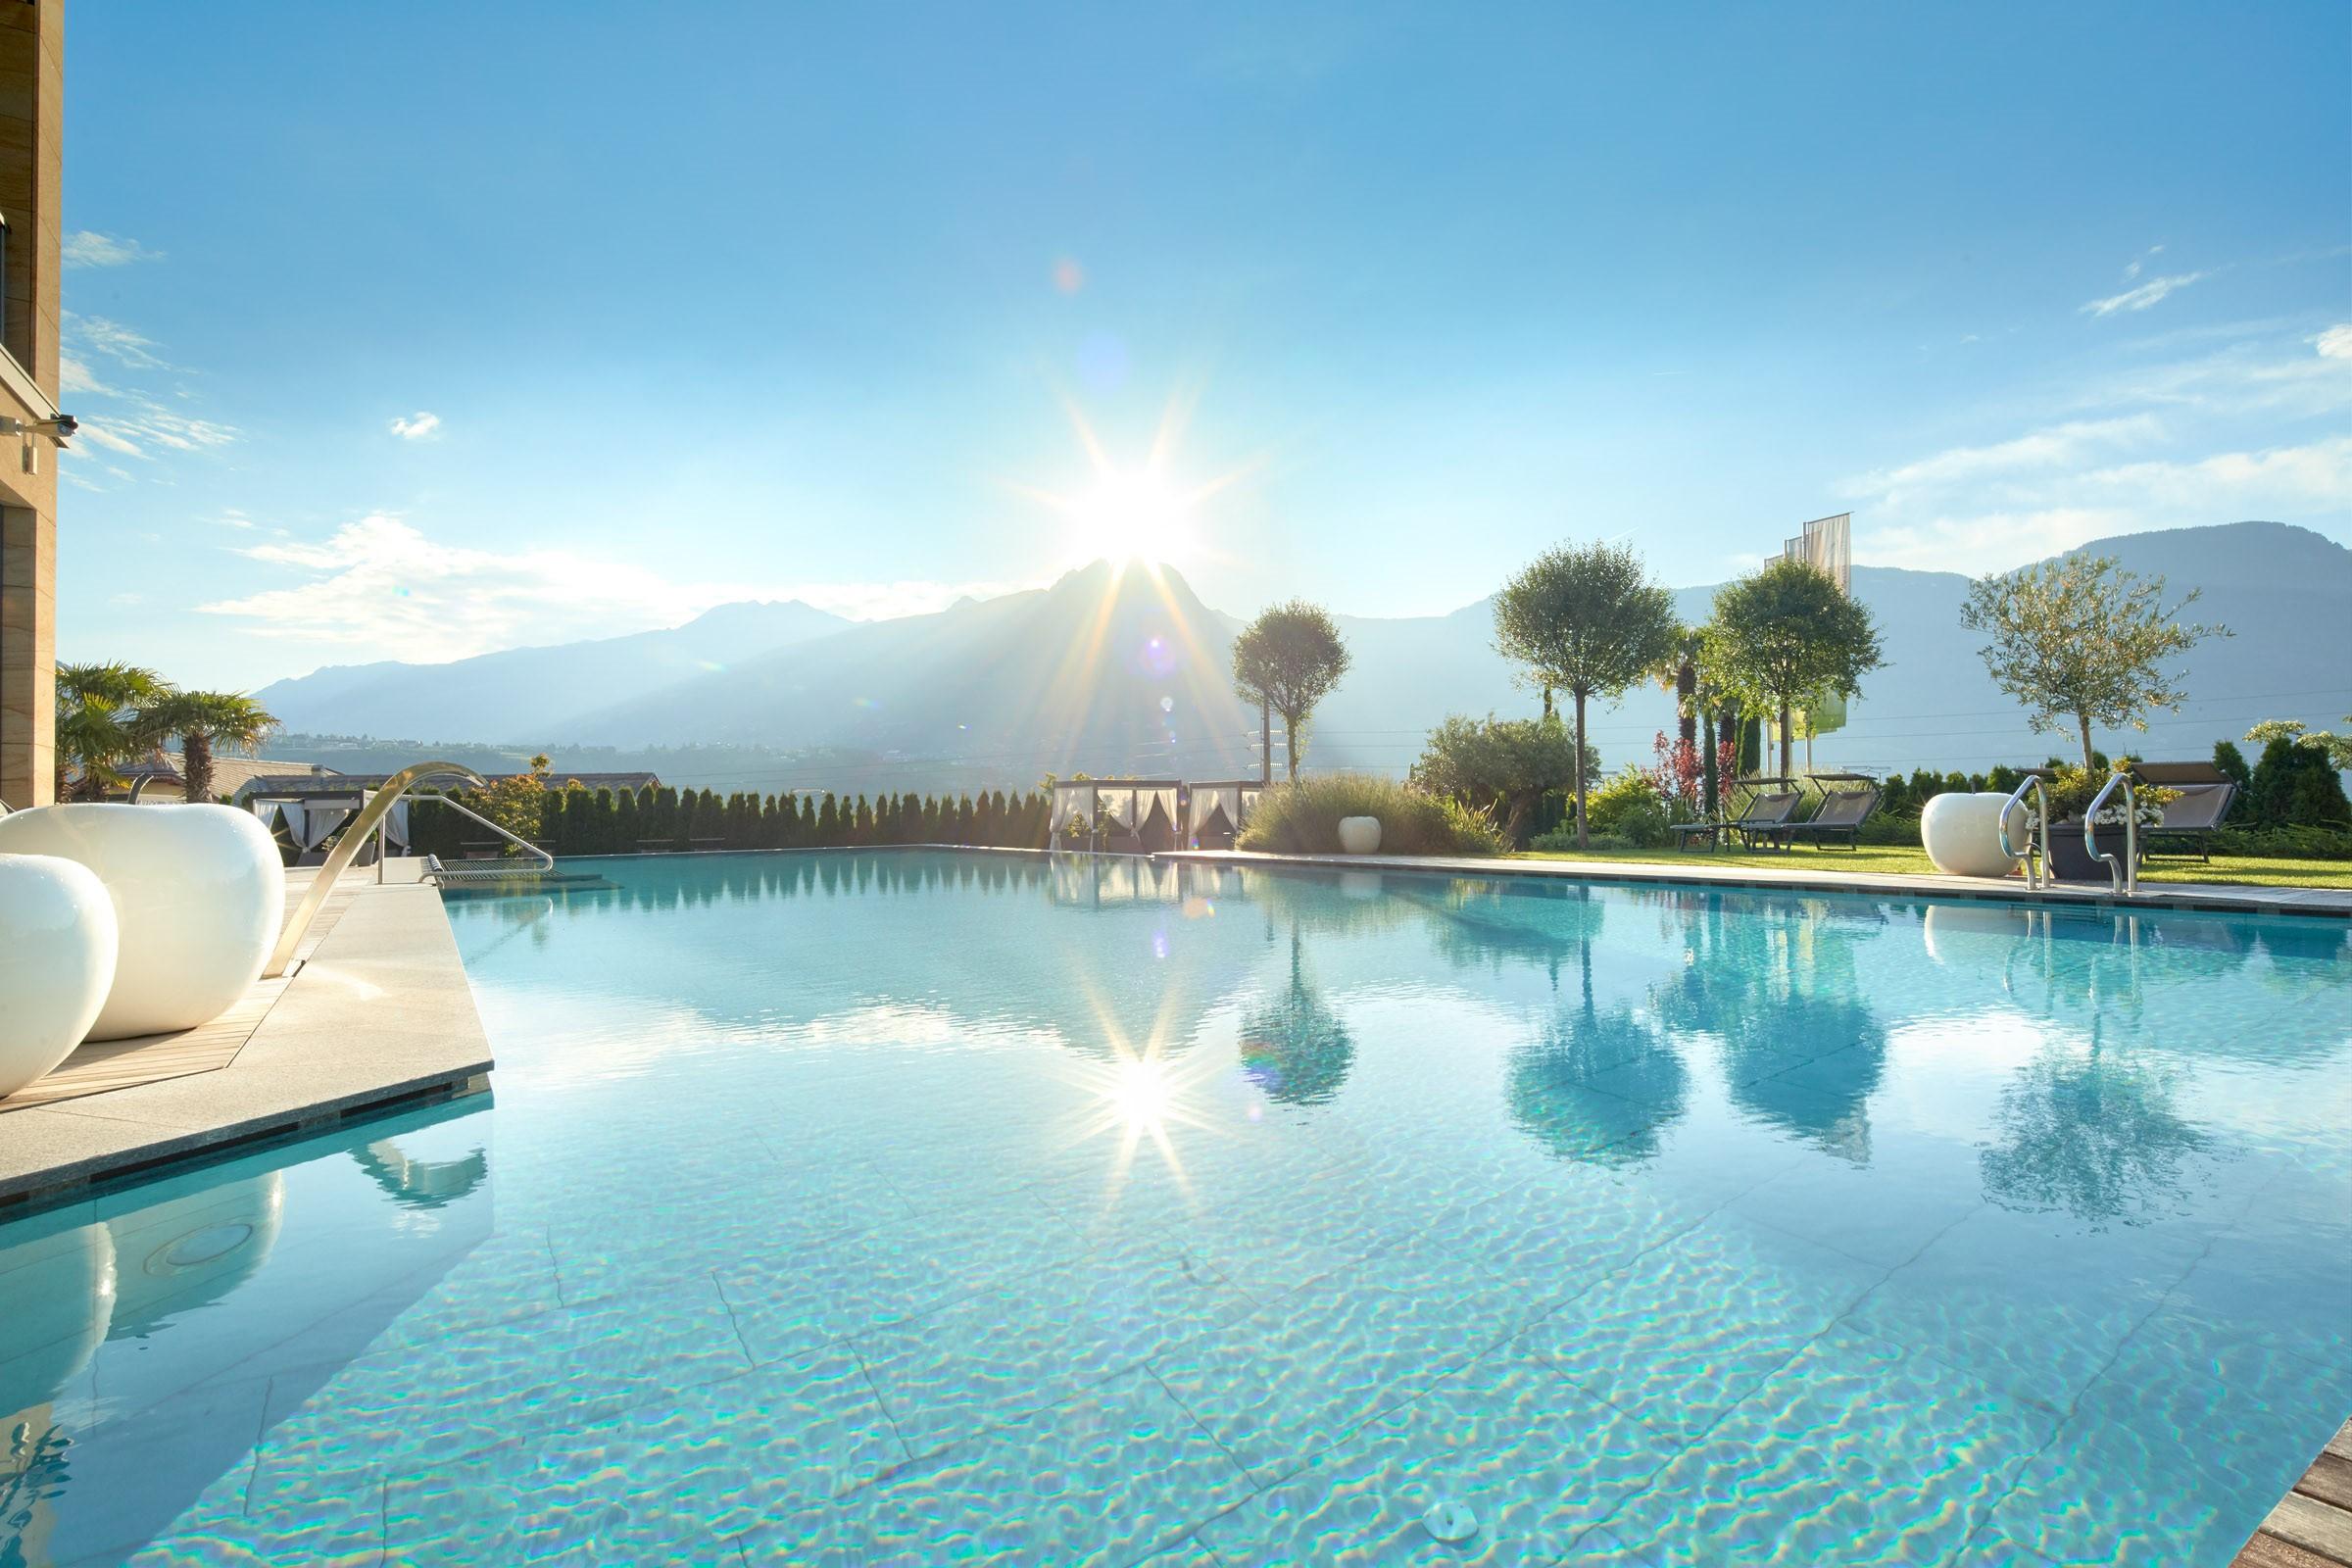 Hotel In Marling La Maiena Meran Resort